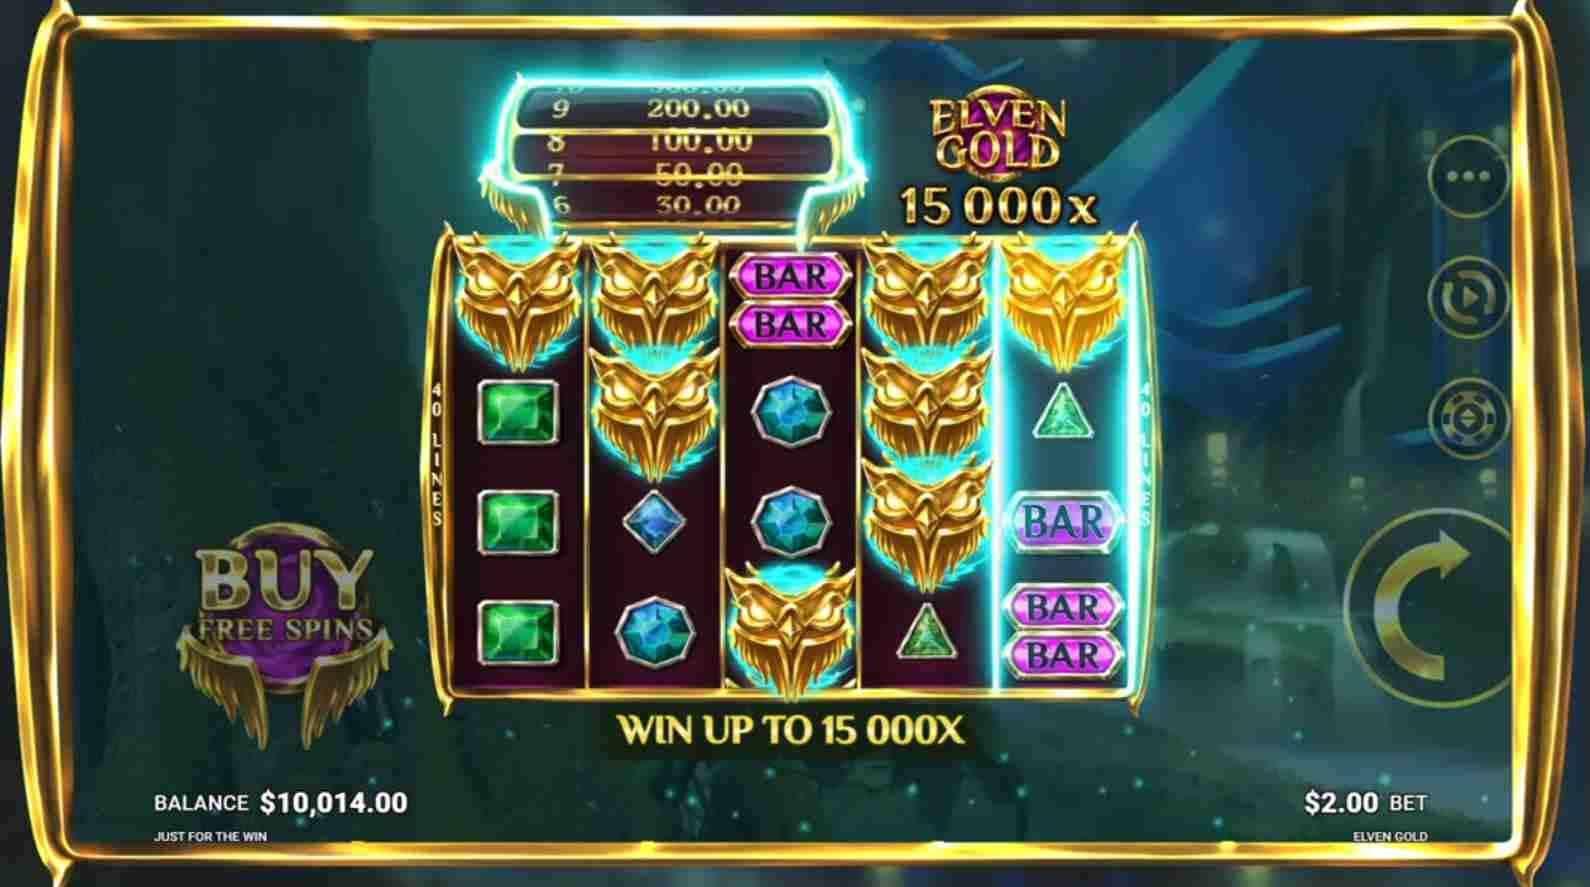 Elven Gold Slot Gameplay